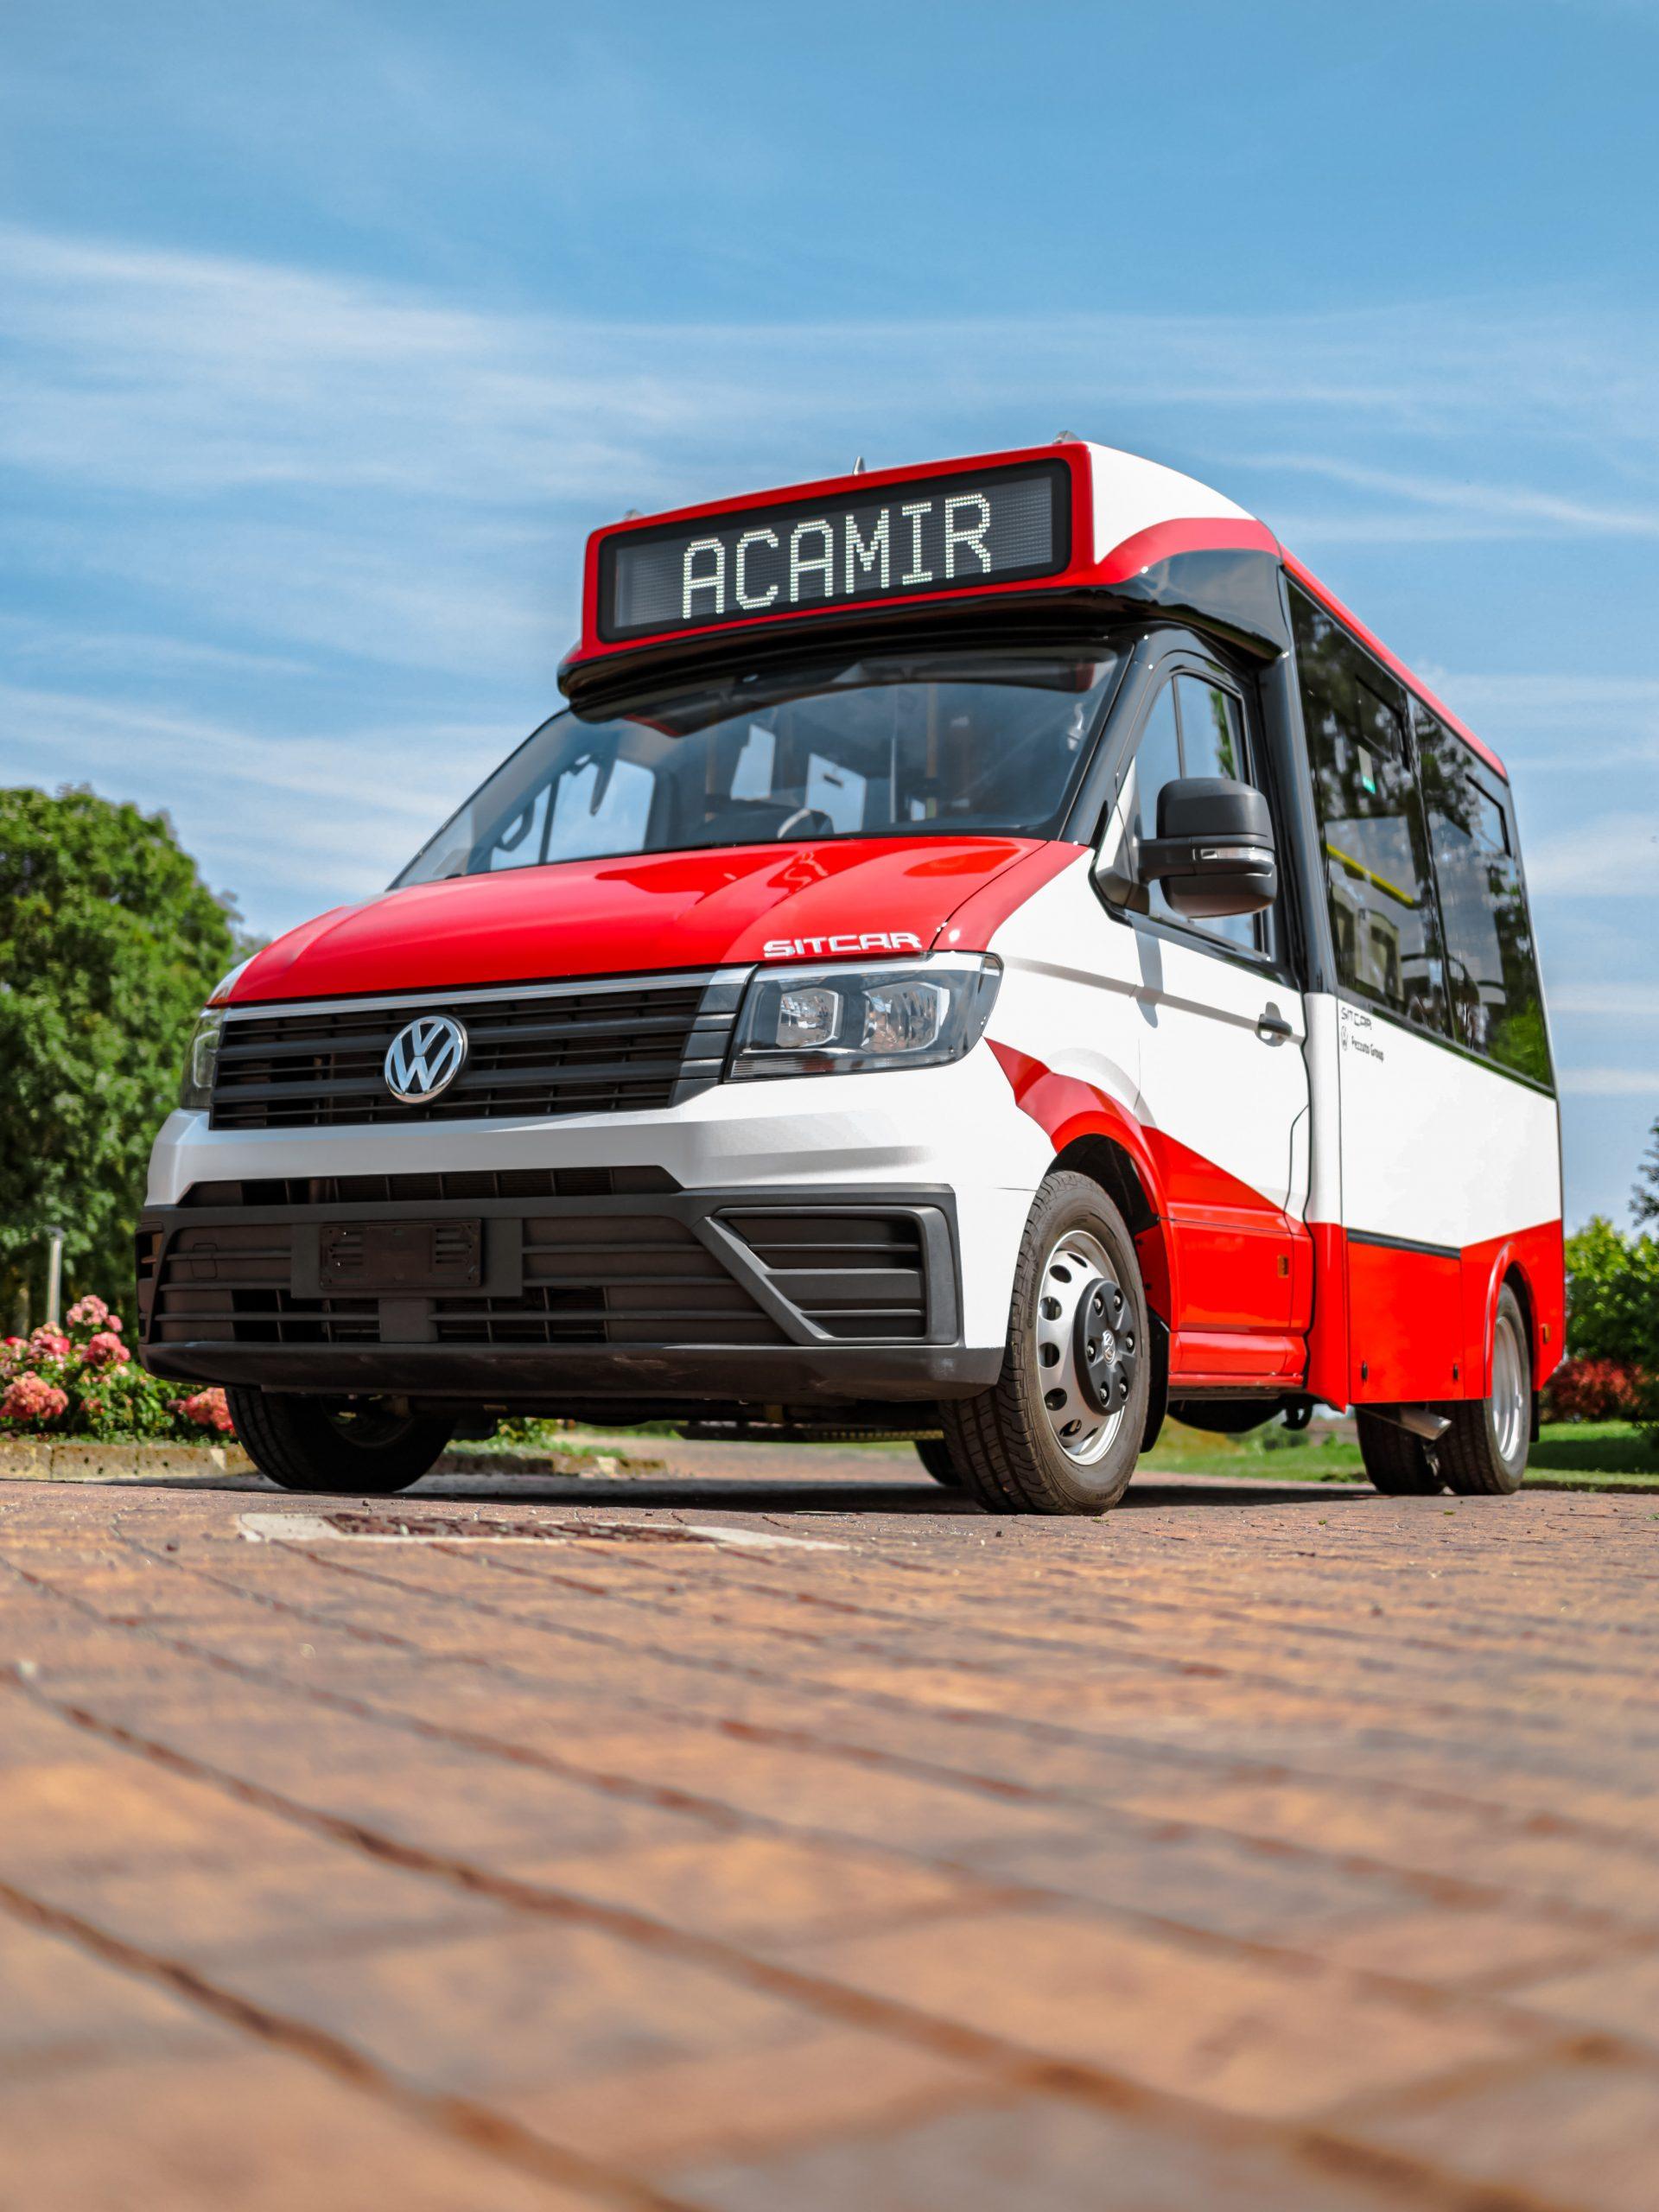 IMG 6348 scaled - New City Tour Urbano - Sitcar Italia autobus